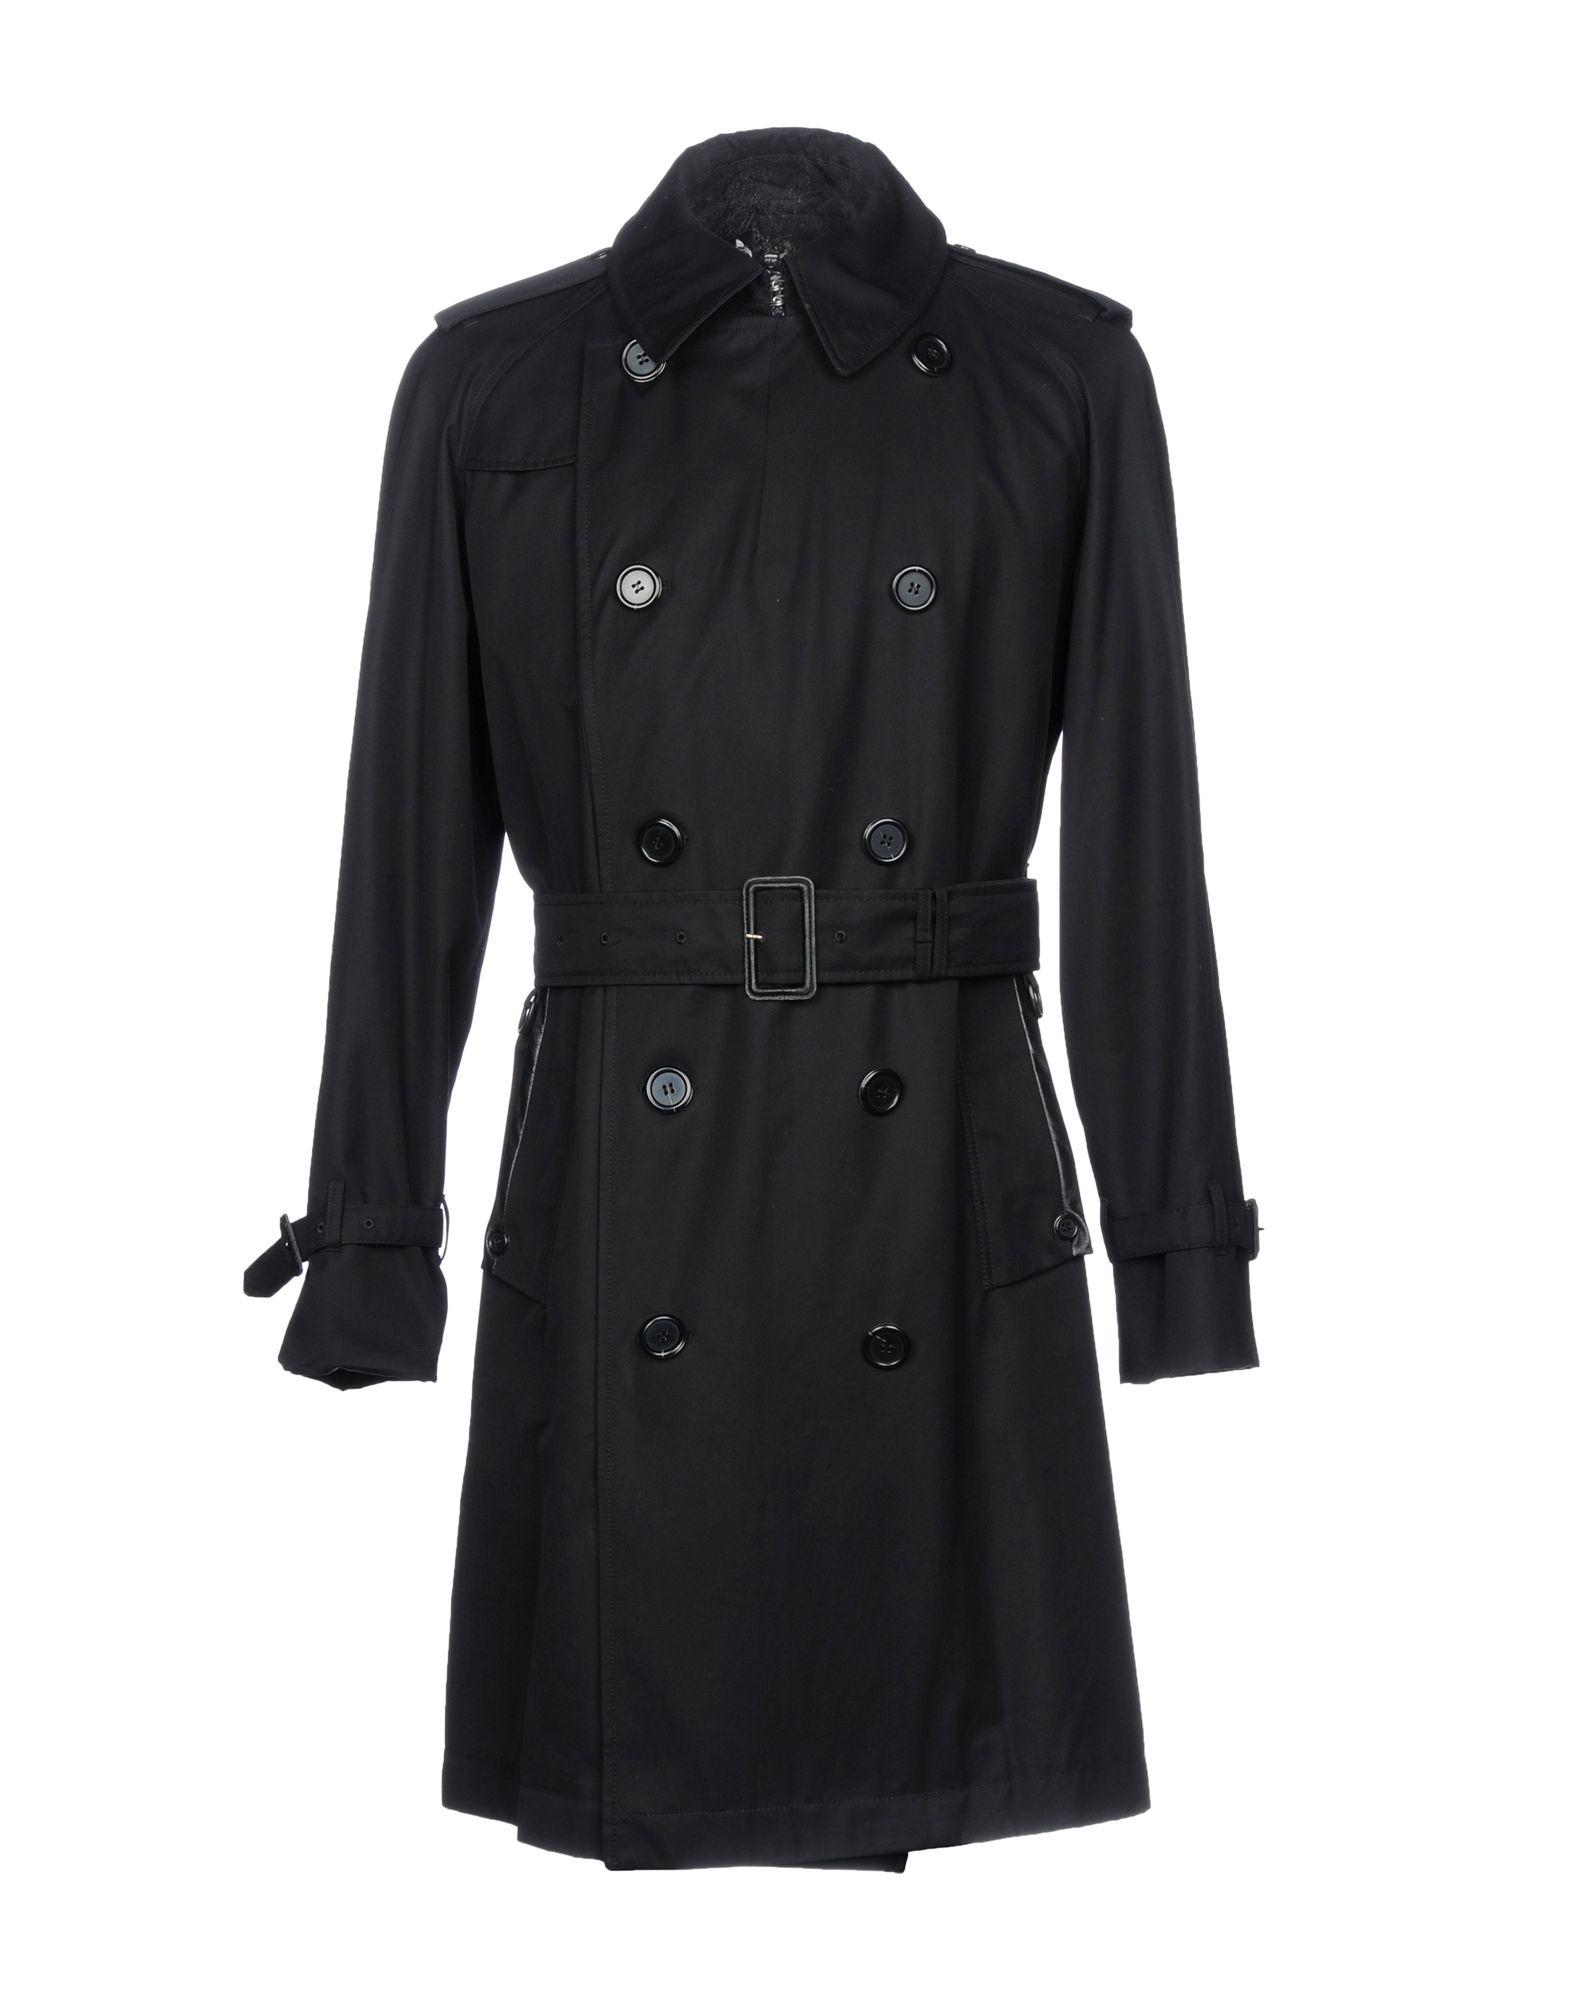 AQUASCUTUM Double Breasted Pea Coat in Black